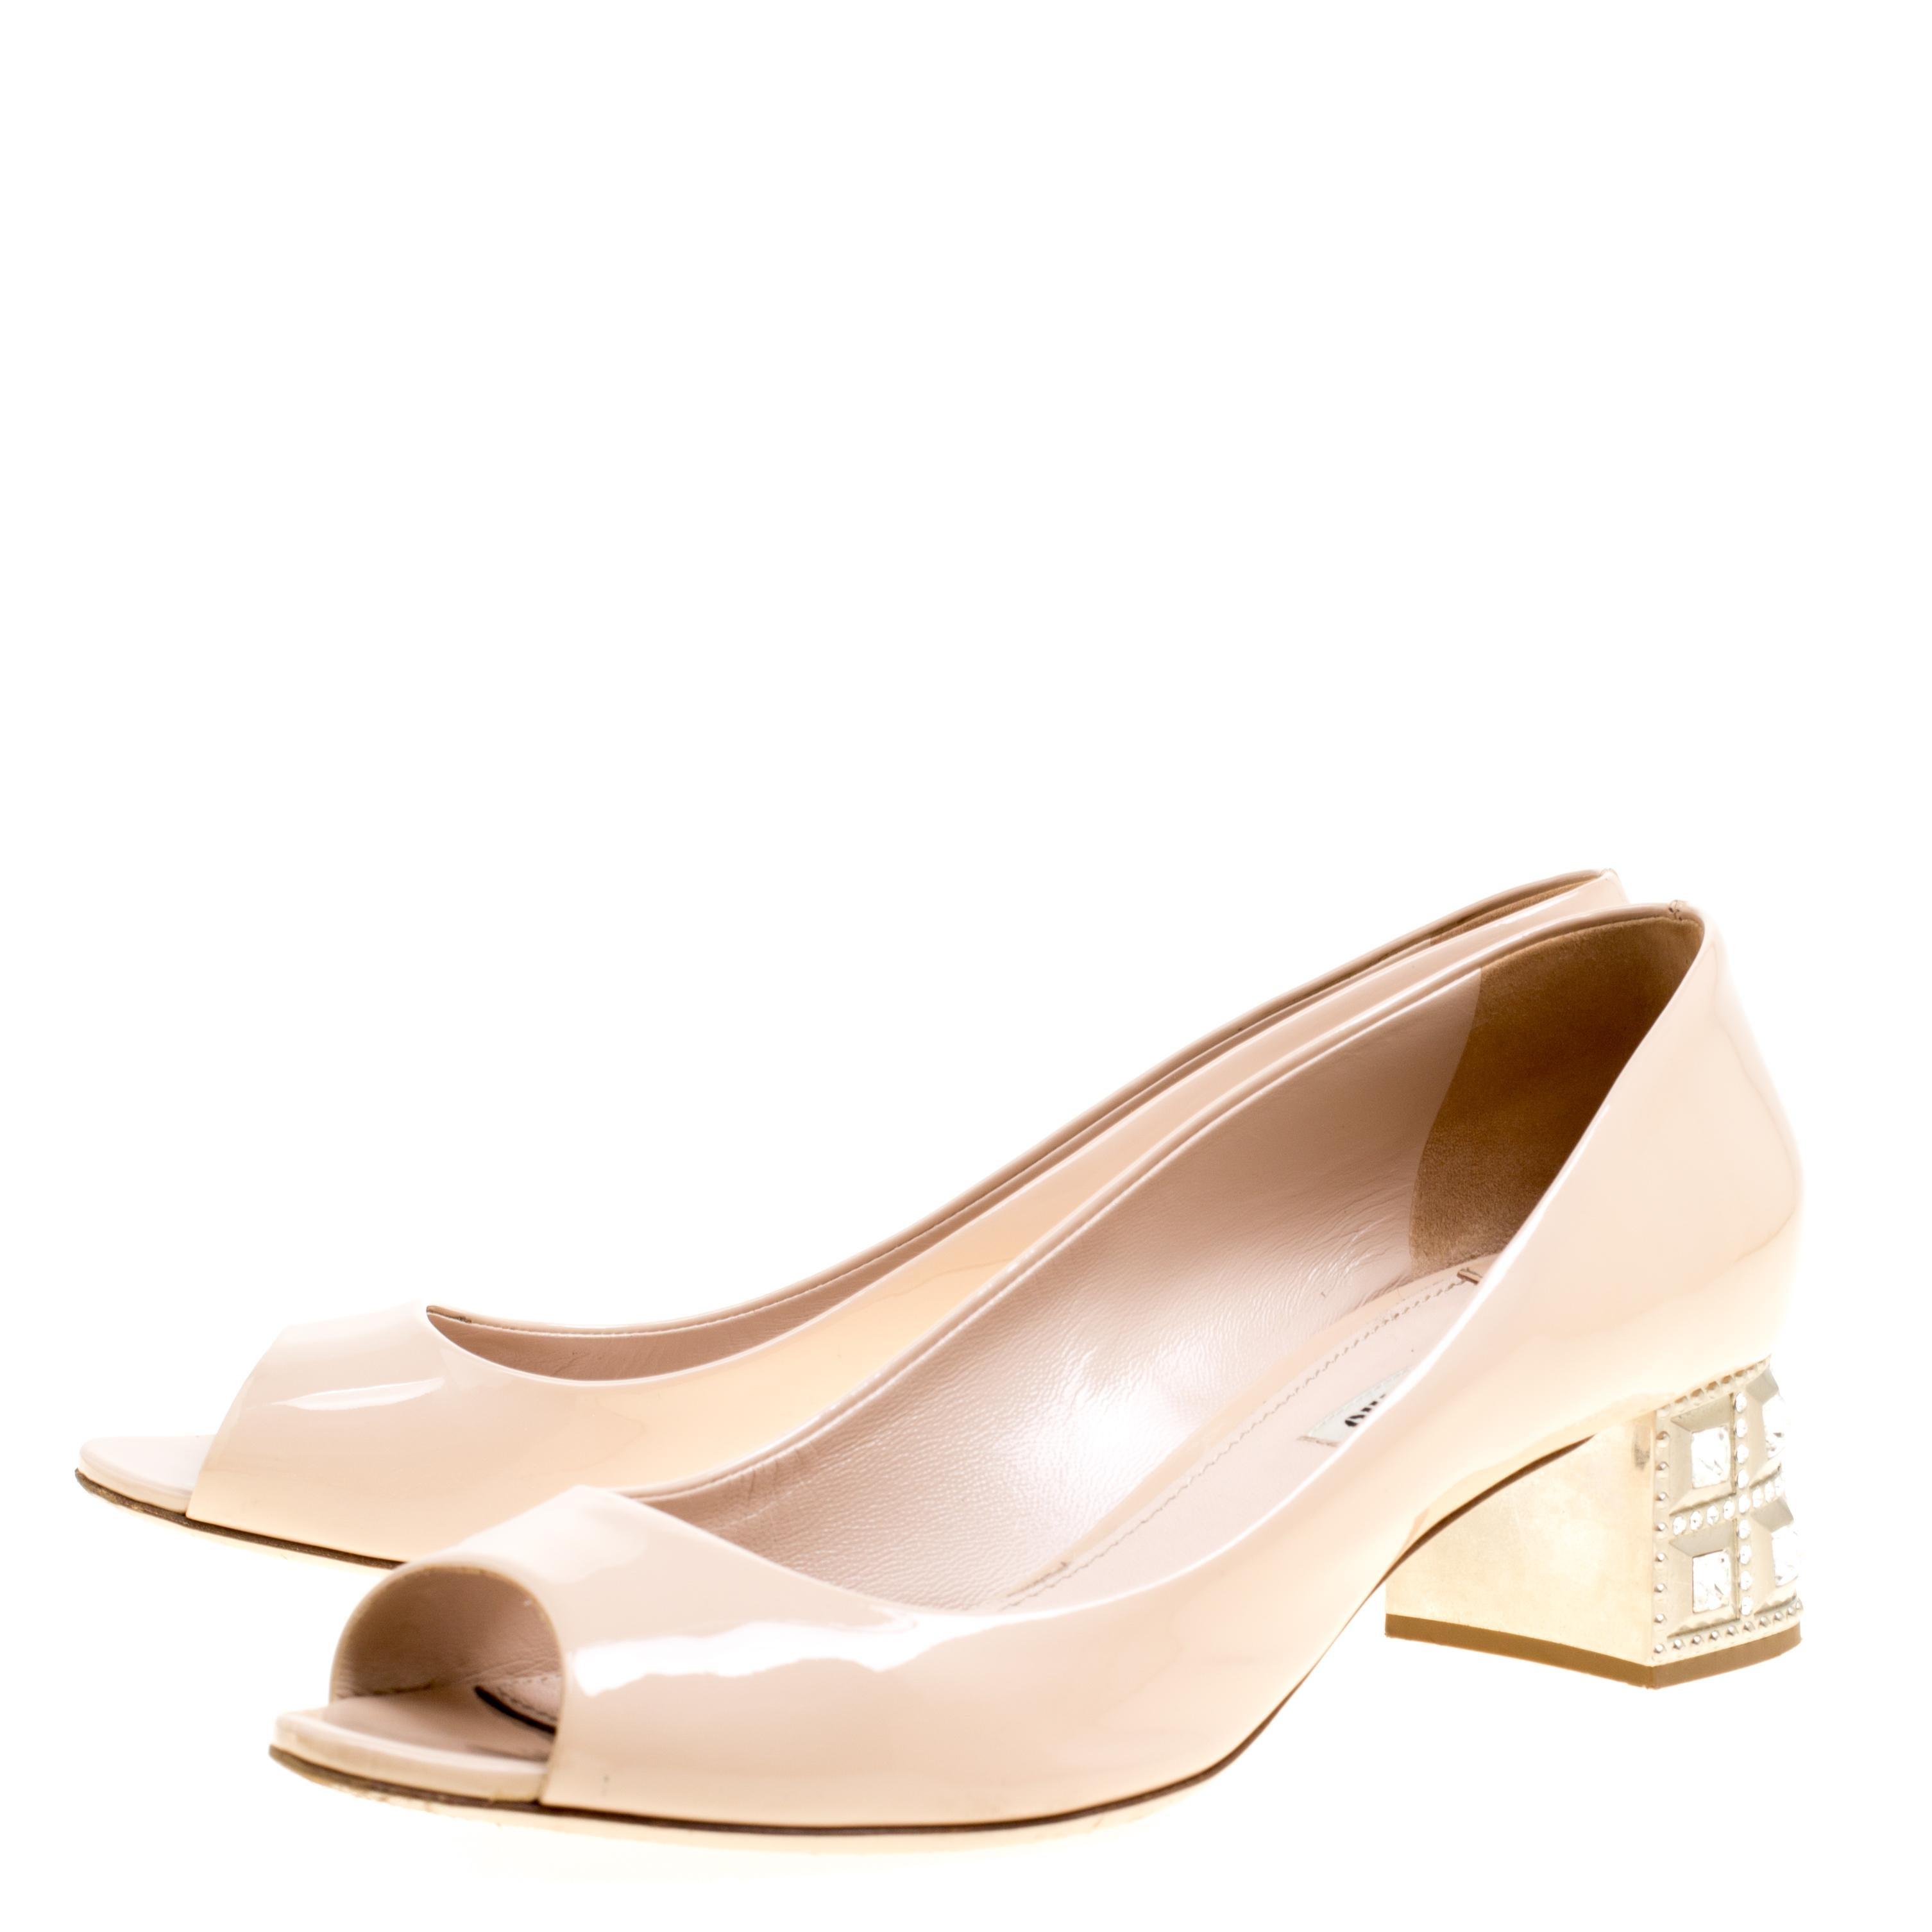 ce4871526c0 Miu Miu Beige Leather Crystal Embellished Block Heel Peep Toe Pumps Size 40 For  Sale at 1stdibs